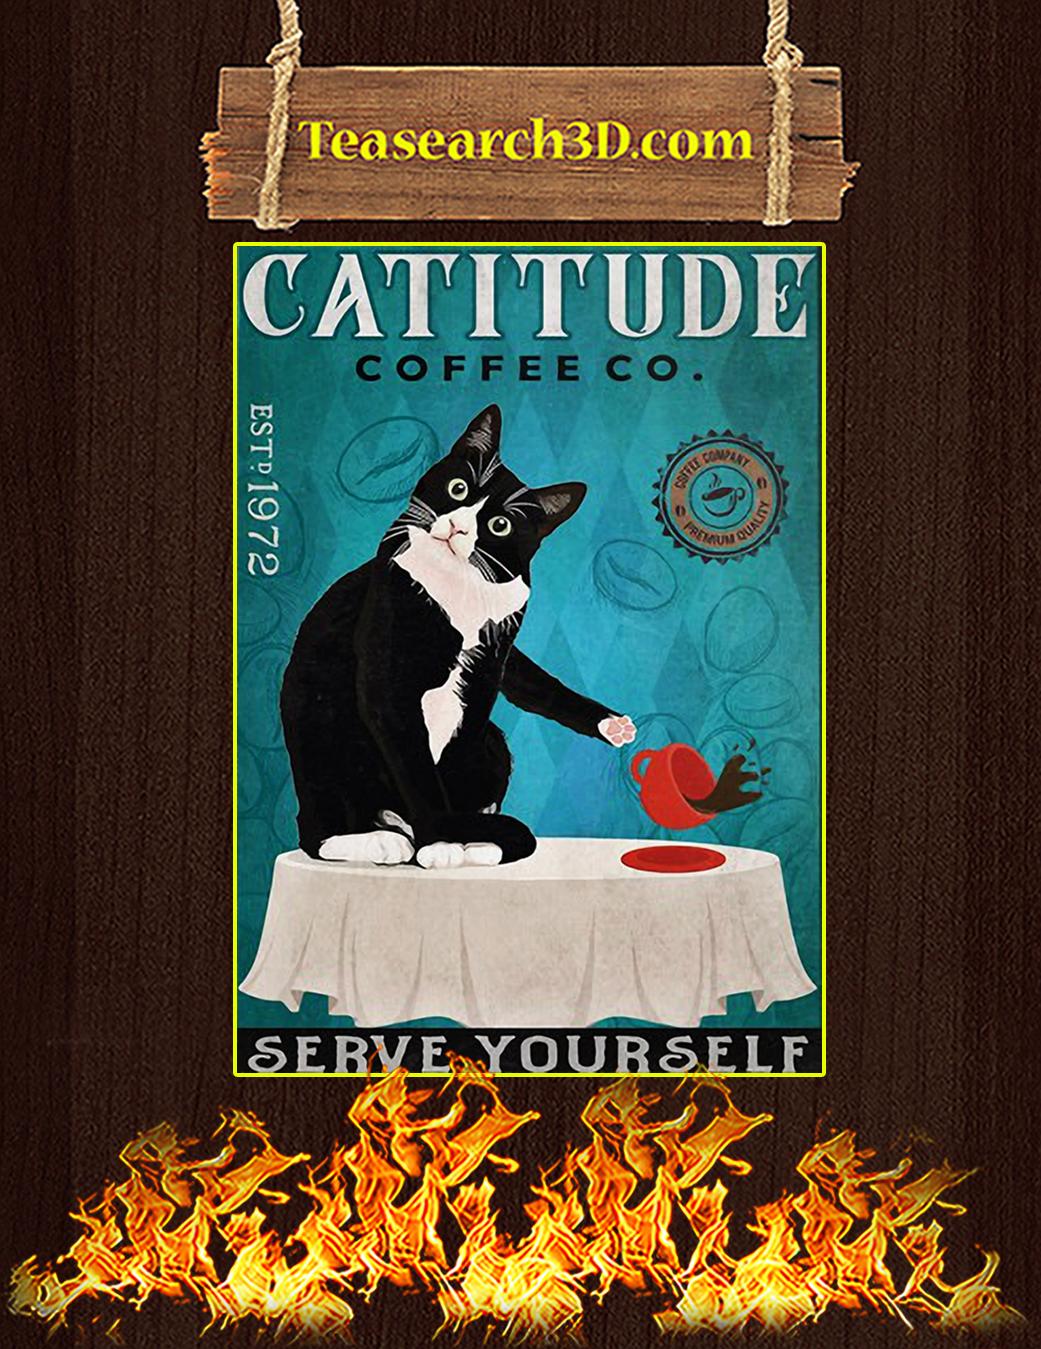 Tuxedo Cat Catitude coffee co serve yourself poster A1